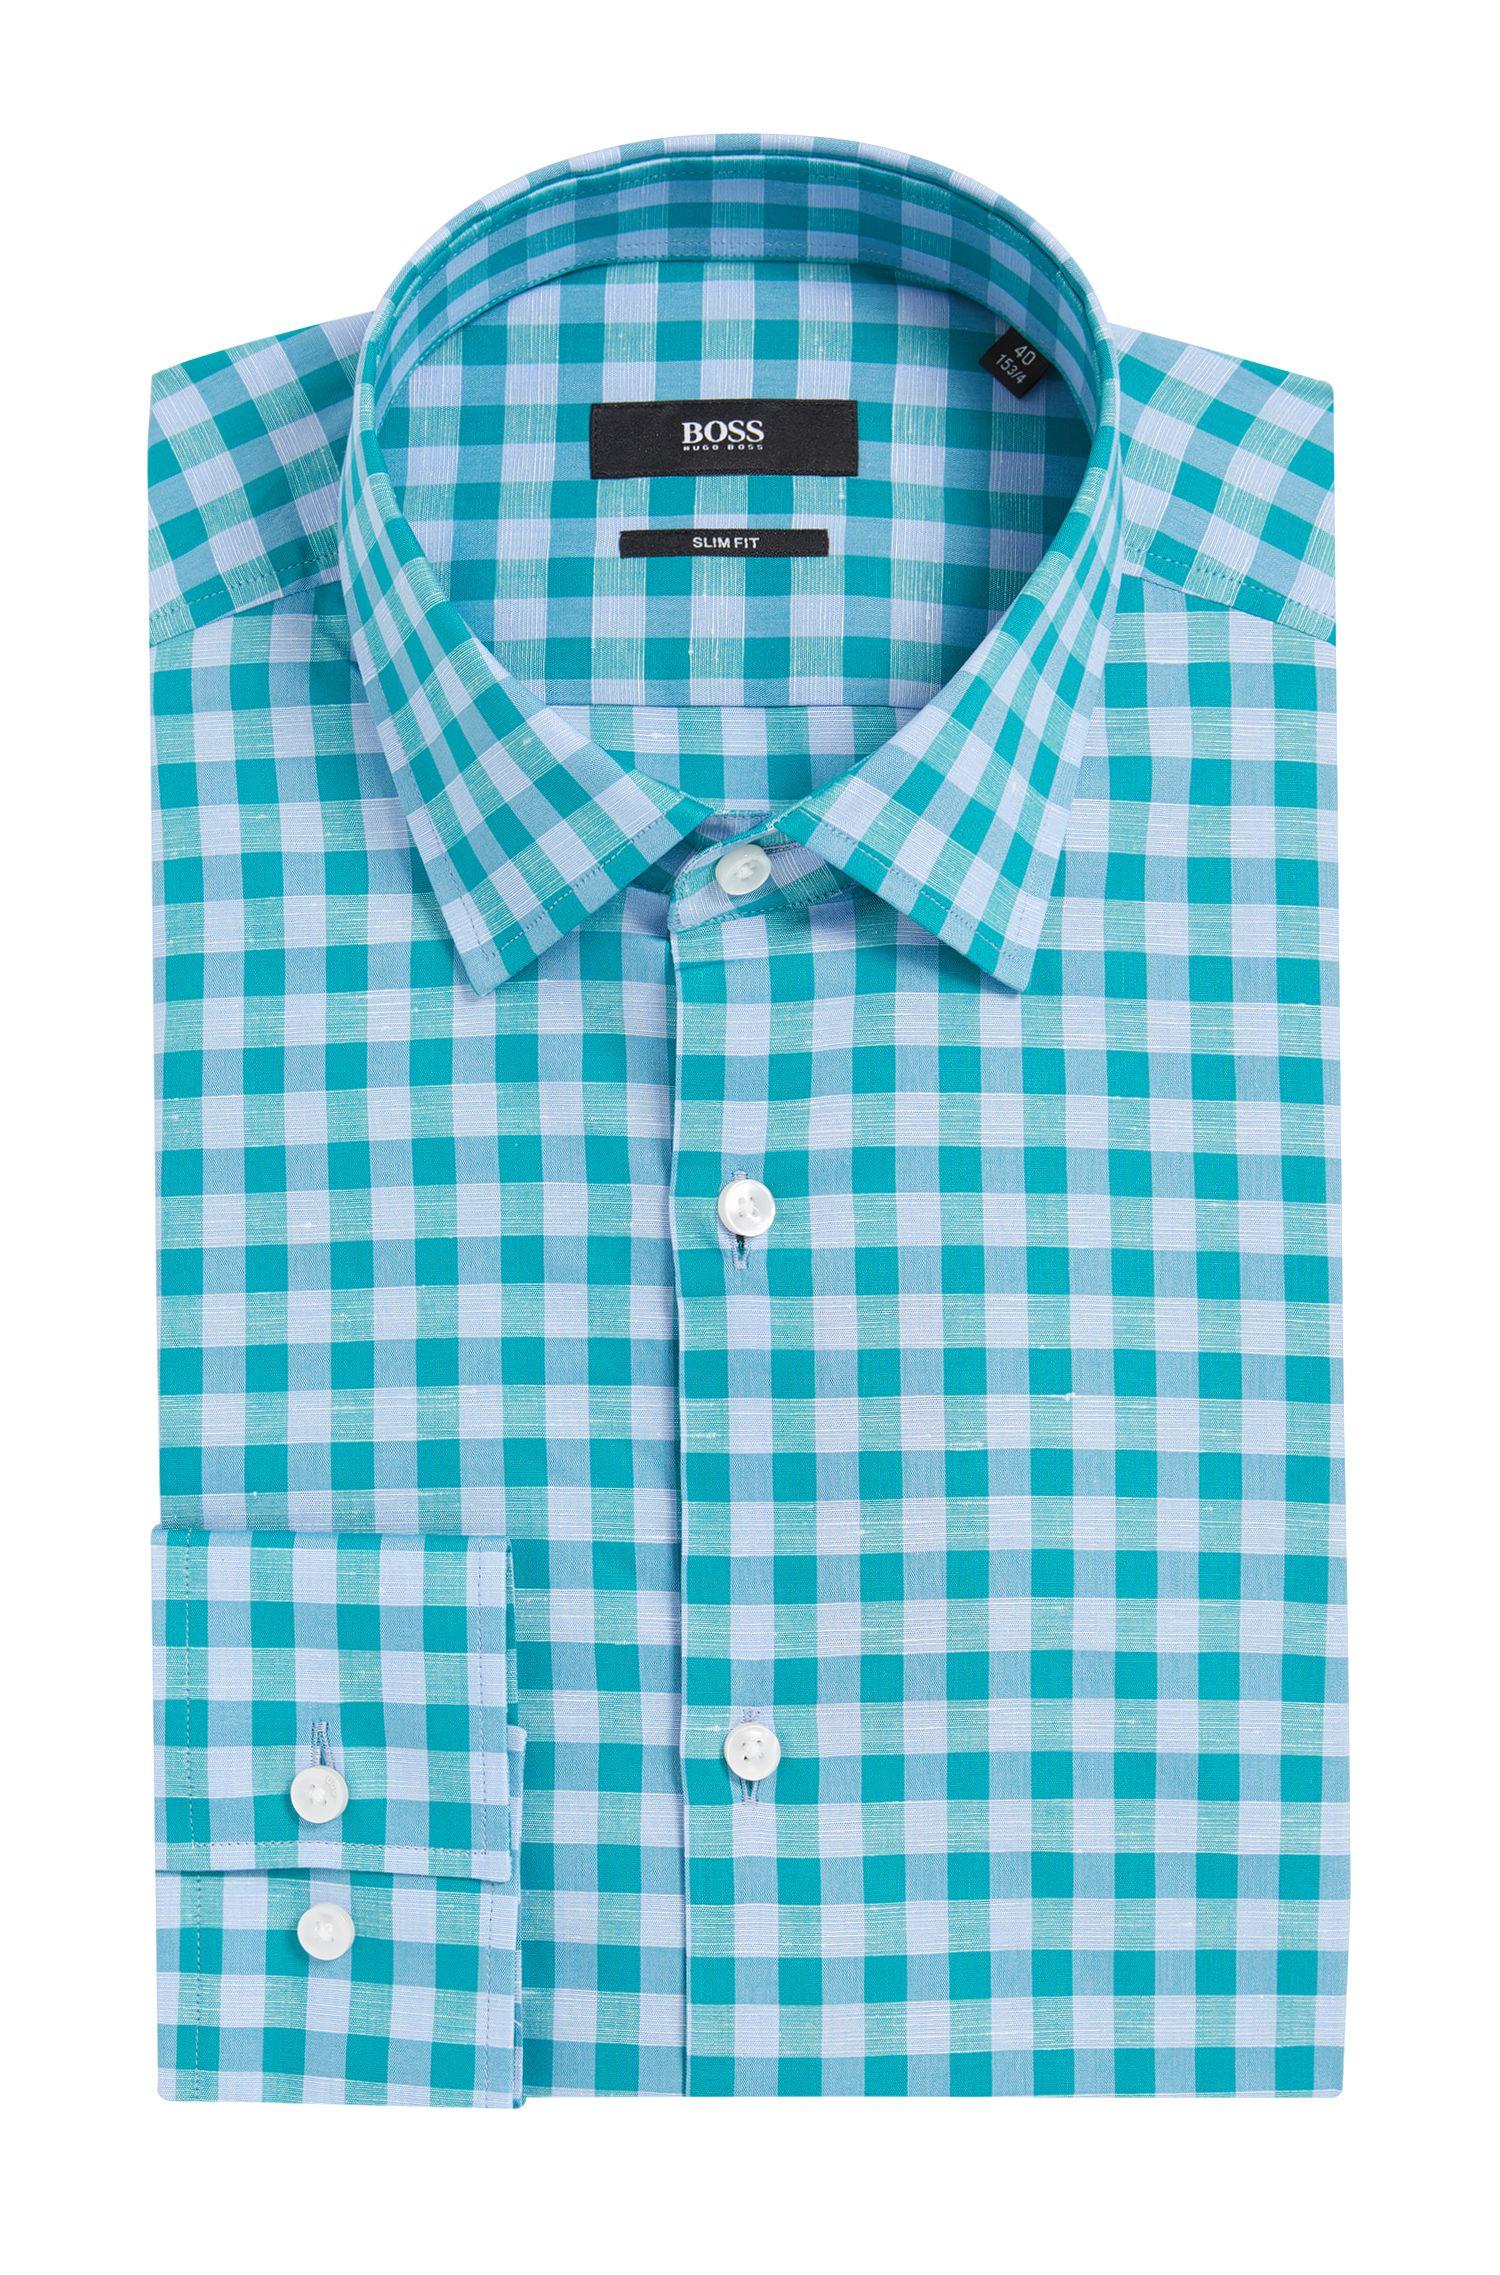 Gingham Italian Cotton Linen Dress Shirt, Slim Fit | Jenno